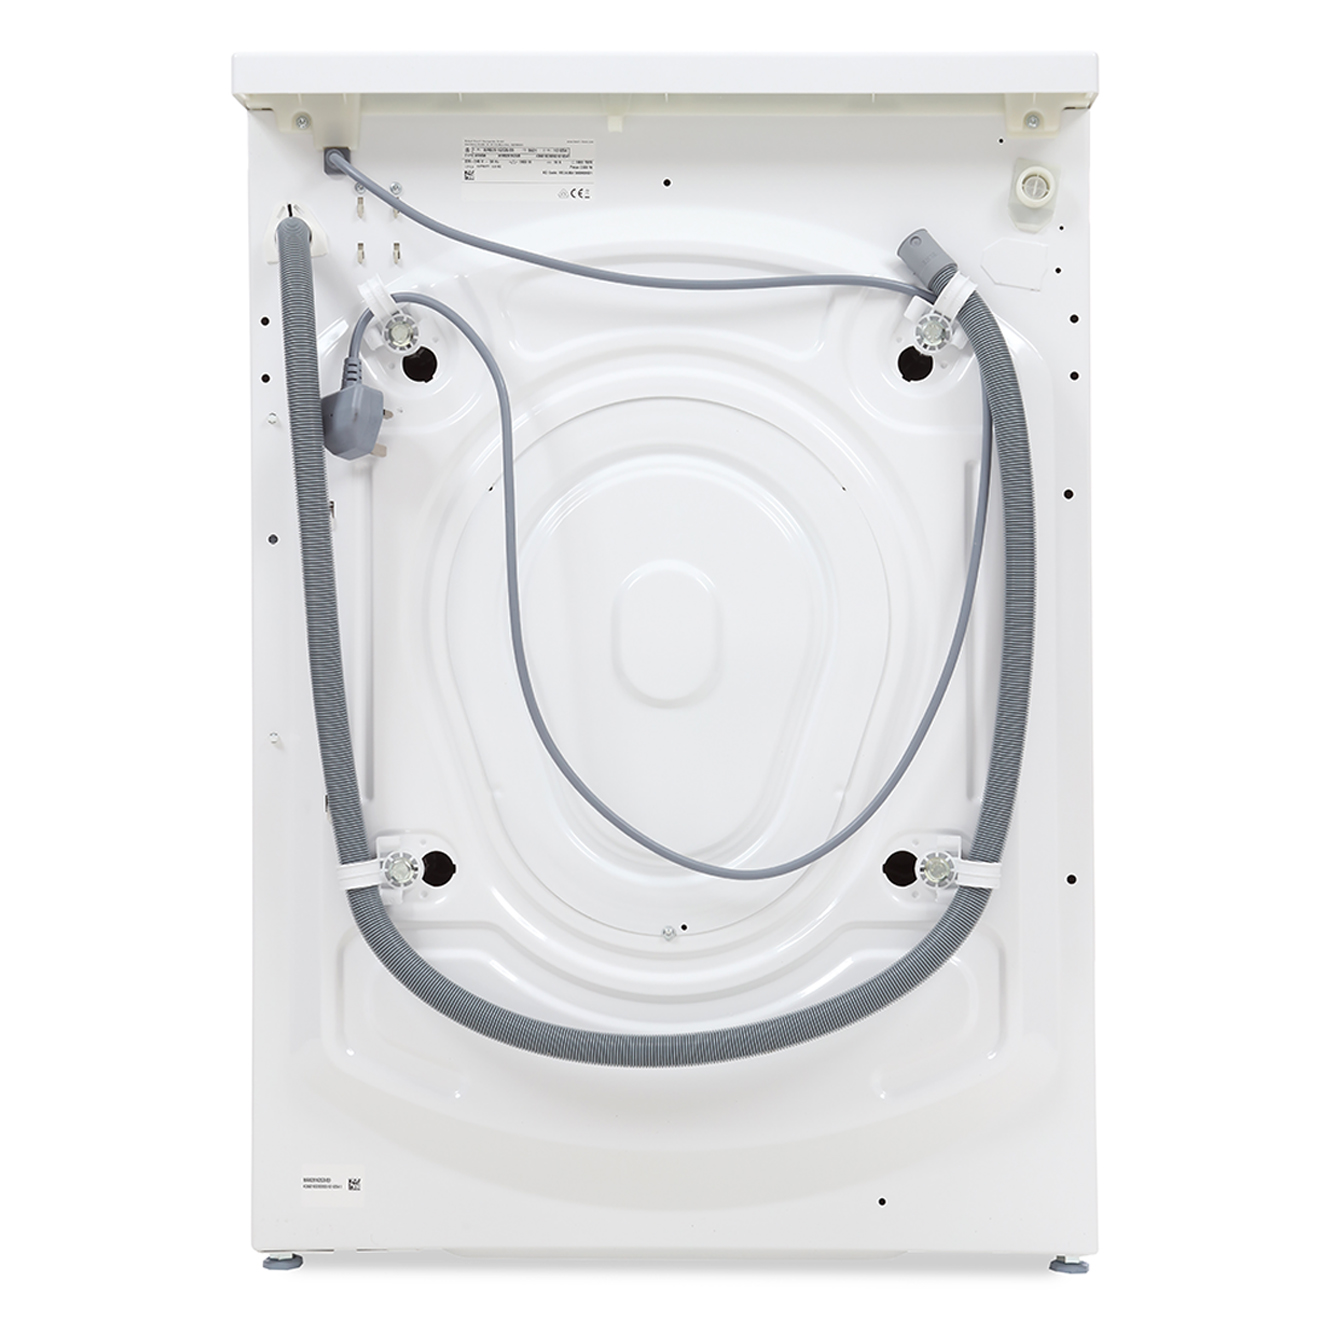 buy bosch maxx 6 wab28162gb washing machine wab28162gb. Black Bedroom Furniture Sets. Home Design Ideas